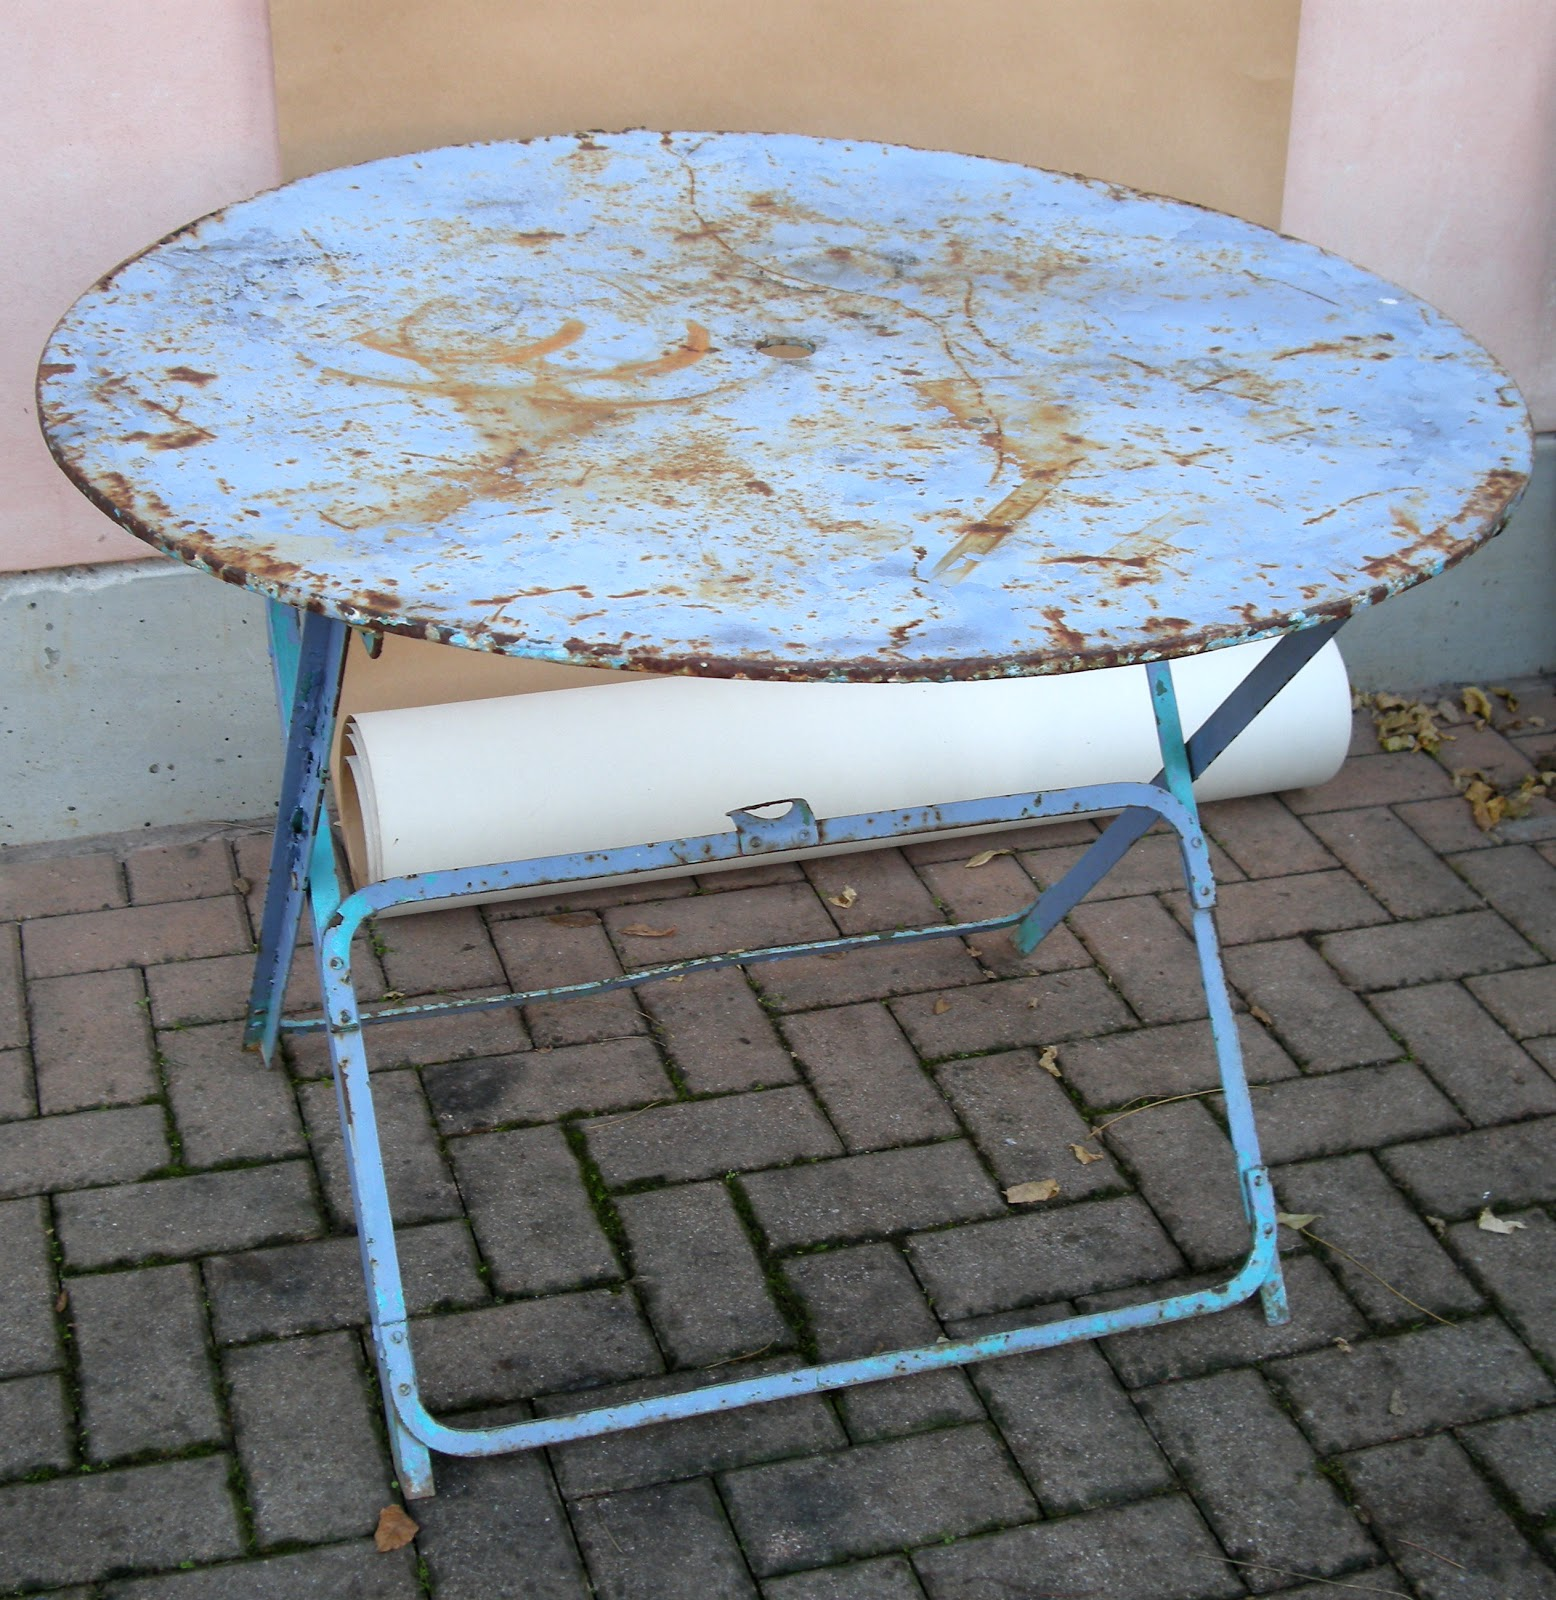 Rimodern tavolo da giardino pieghevole francese french - Giardino francese ...